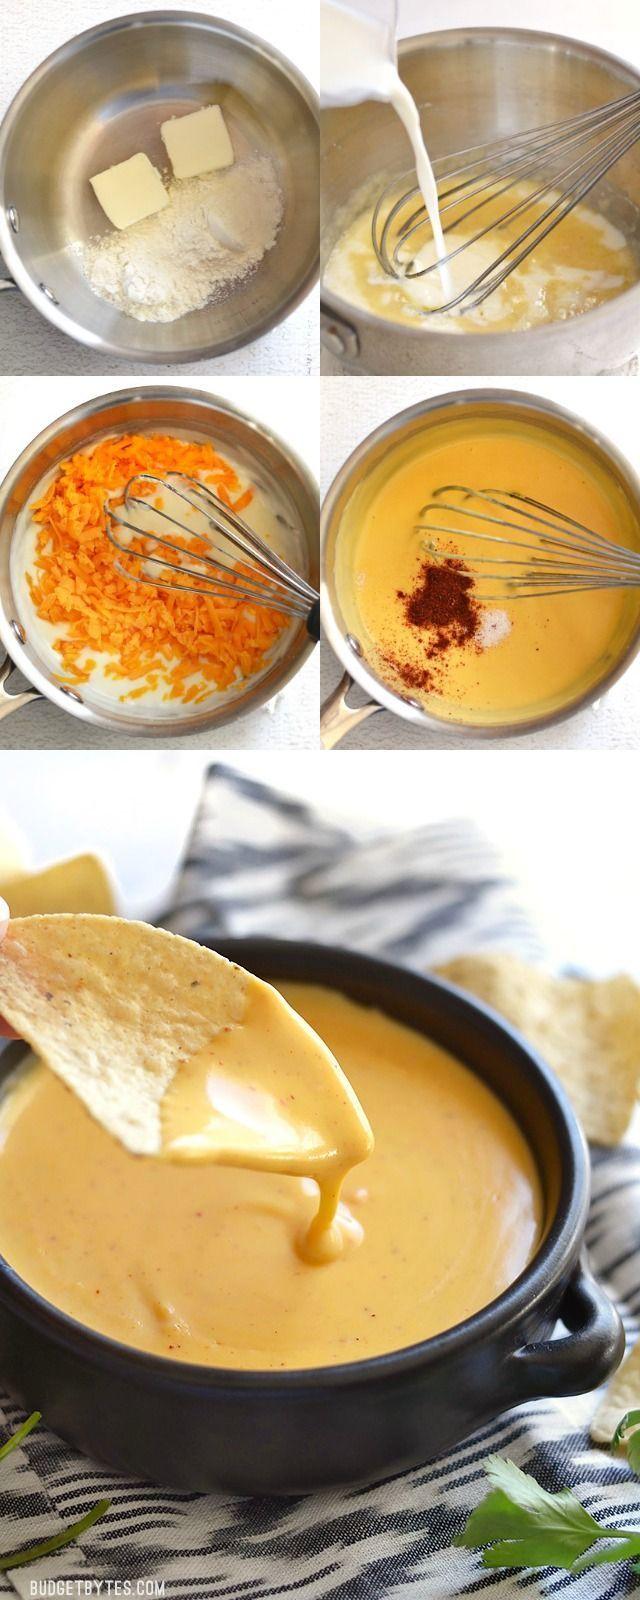 5 Minute Nacho Cheese Sauce Budget Bytes